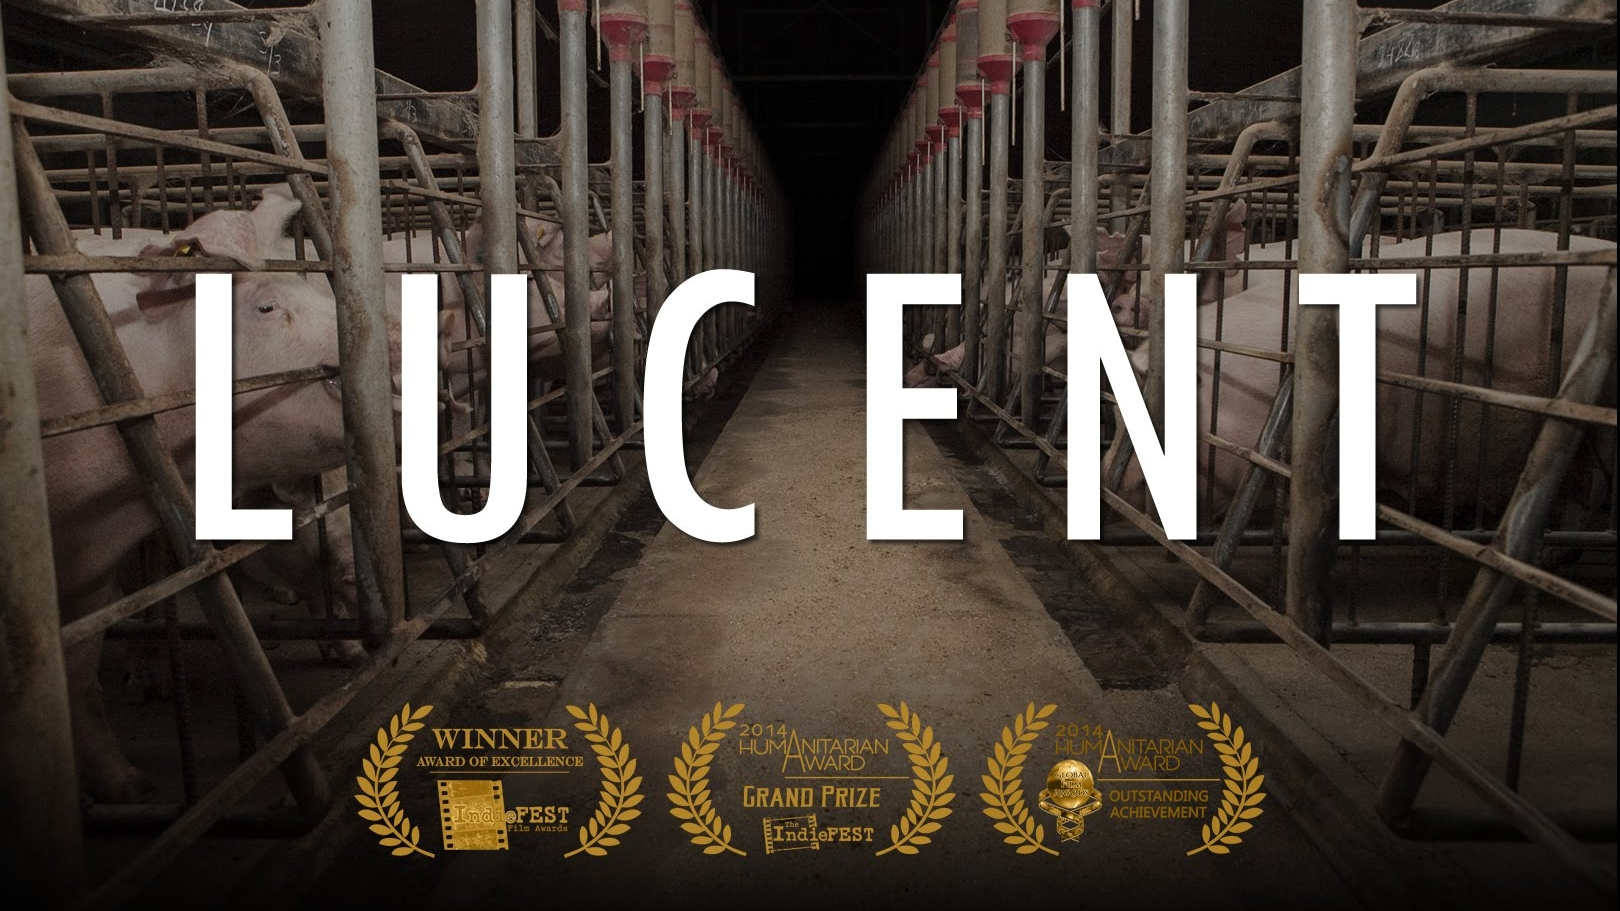 Lucent (Australian pork<br>industry documentary)